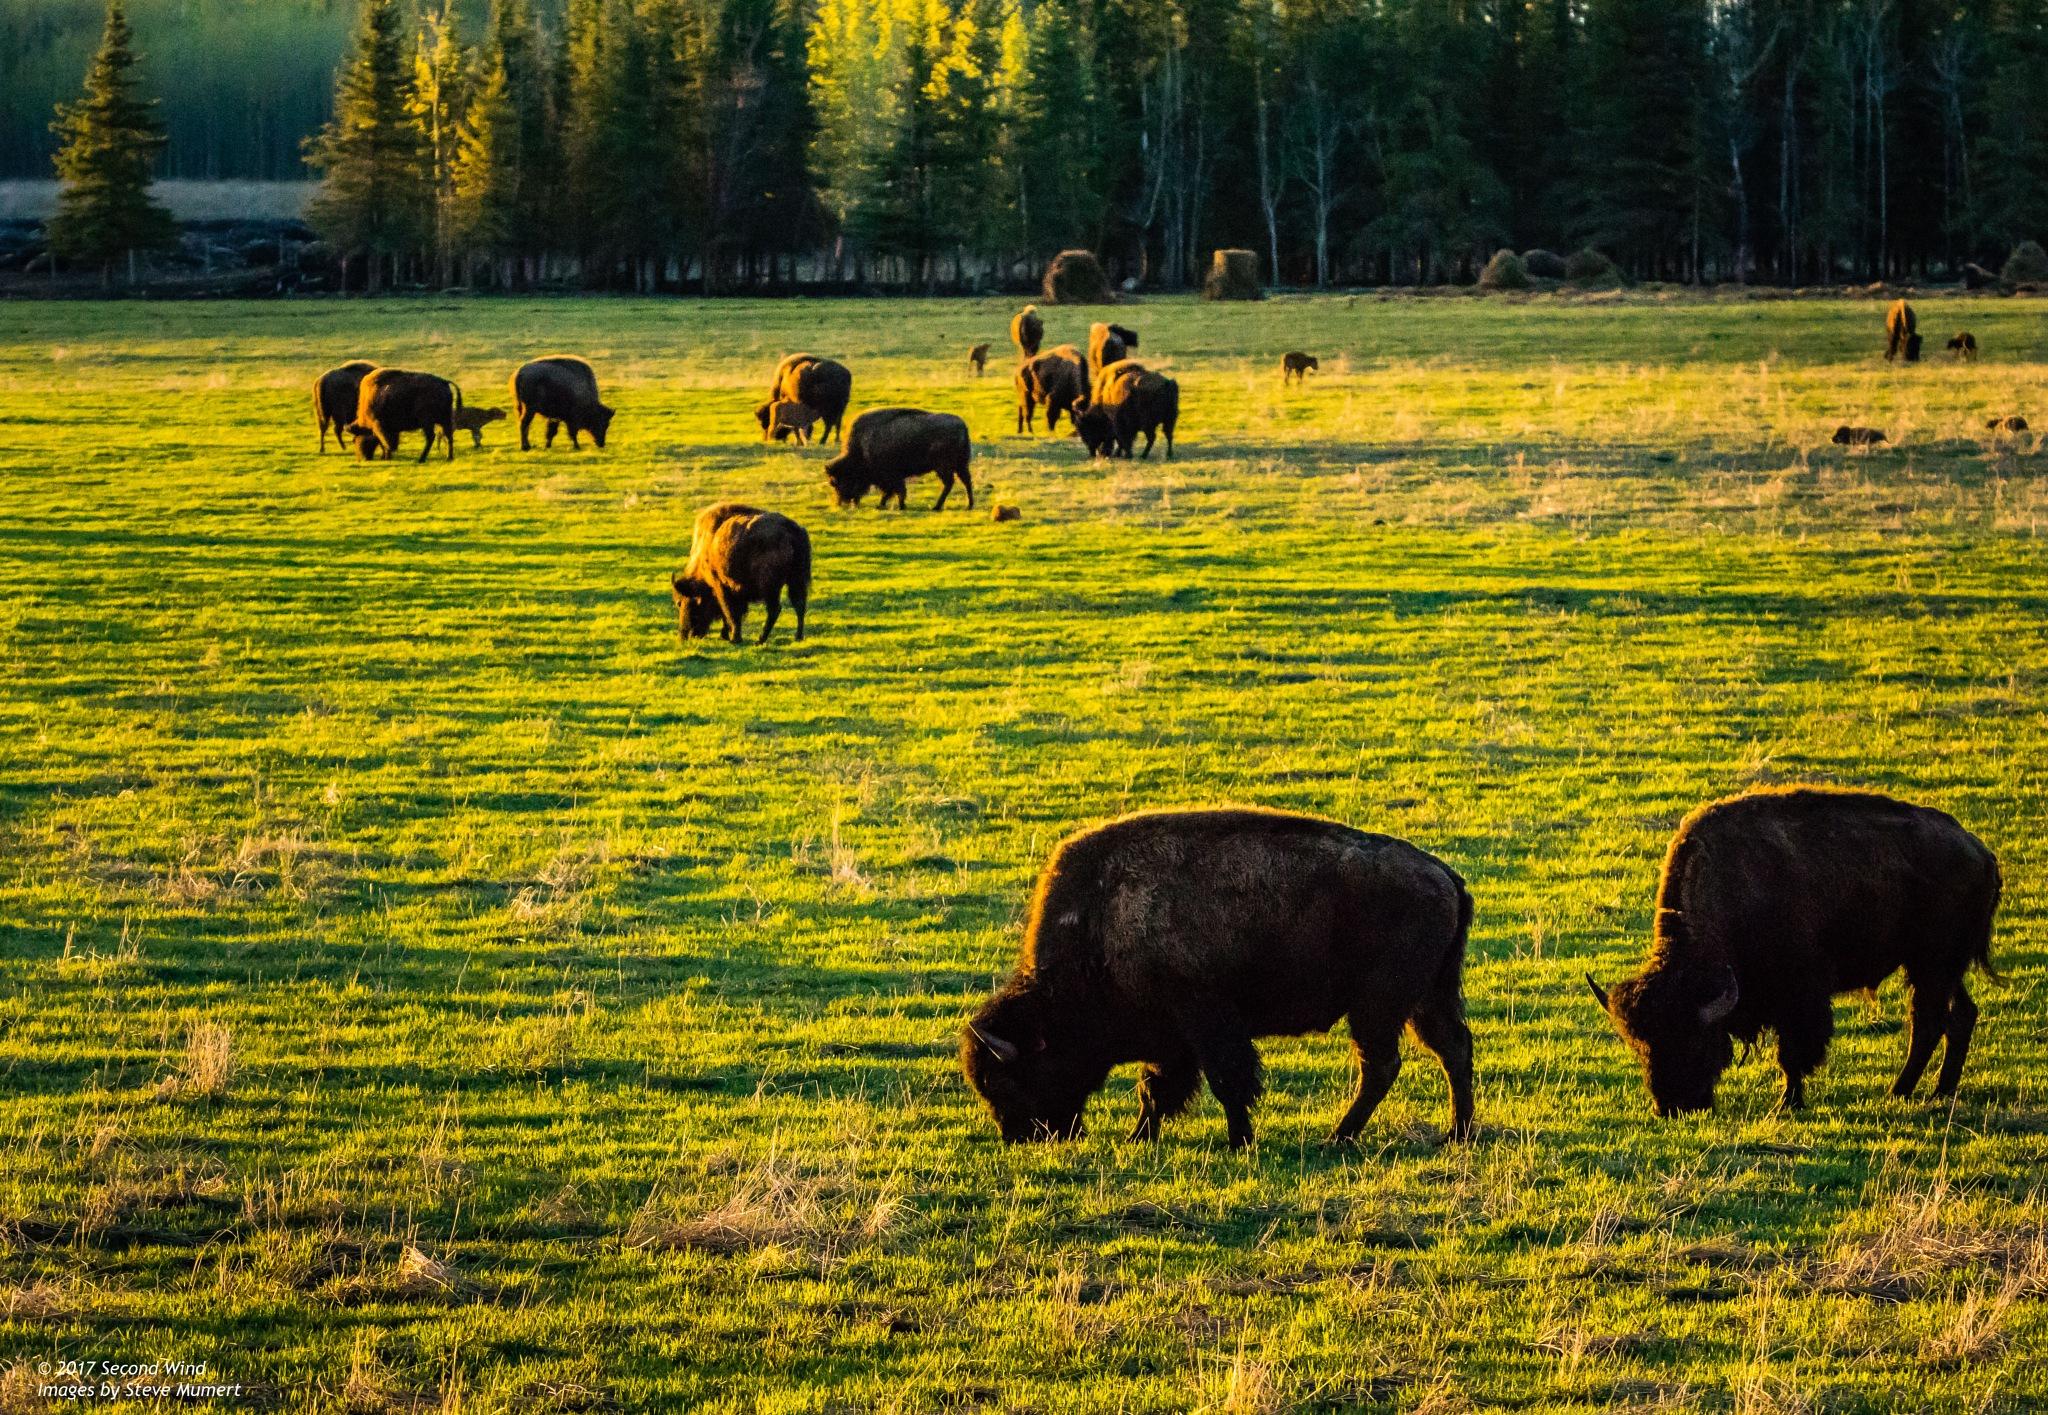 Pastoral Bison :-) by SteveMumert